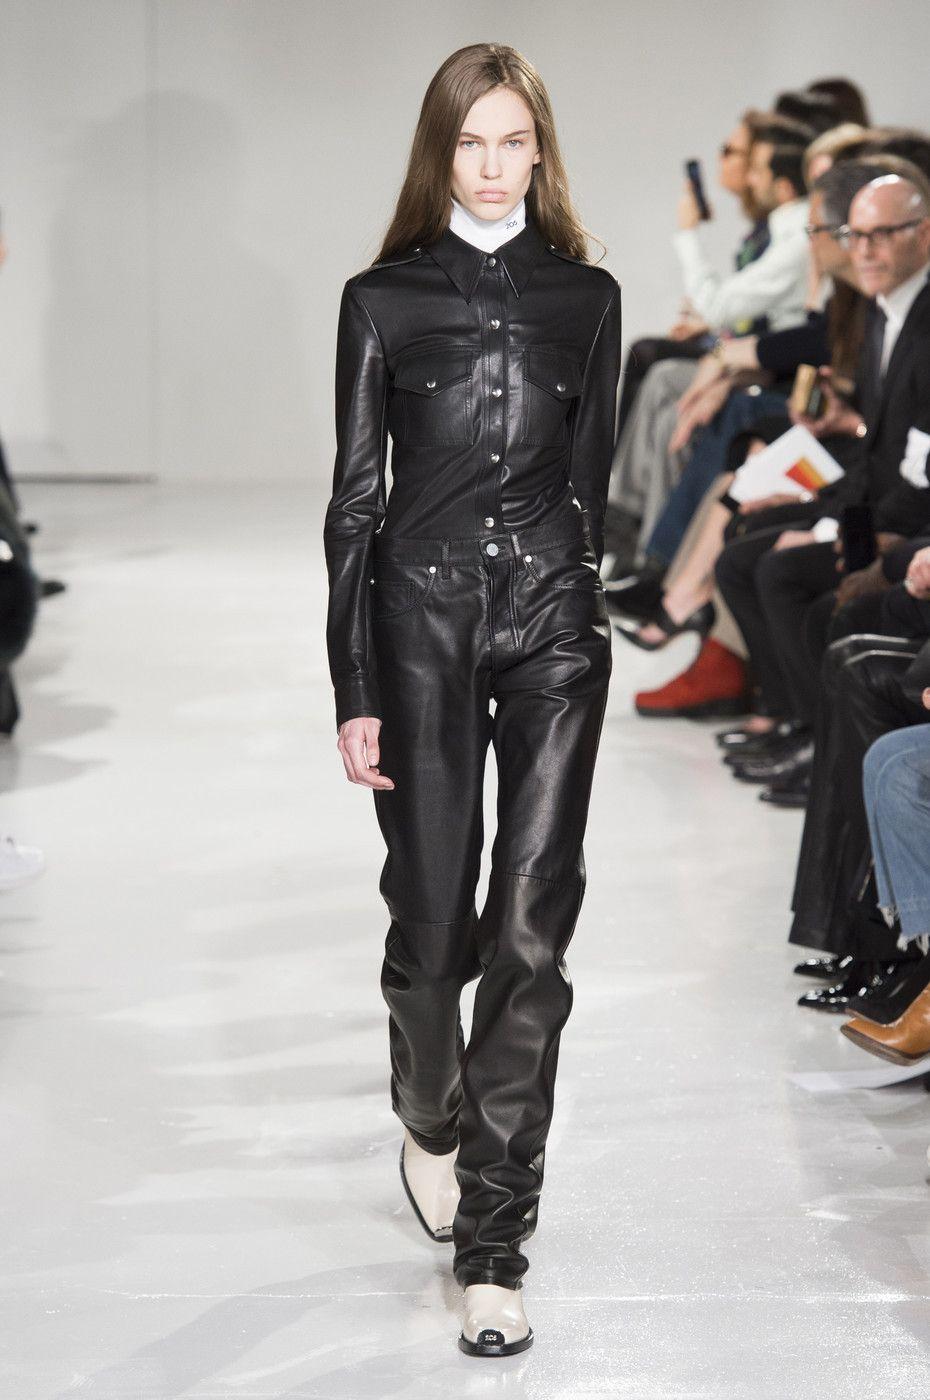 Lex Herl at Calvin Klein Collection RTW F/W 2017